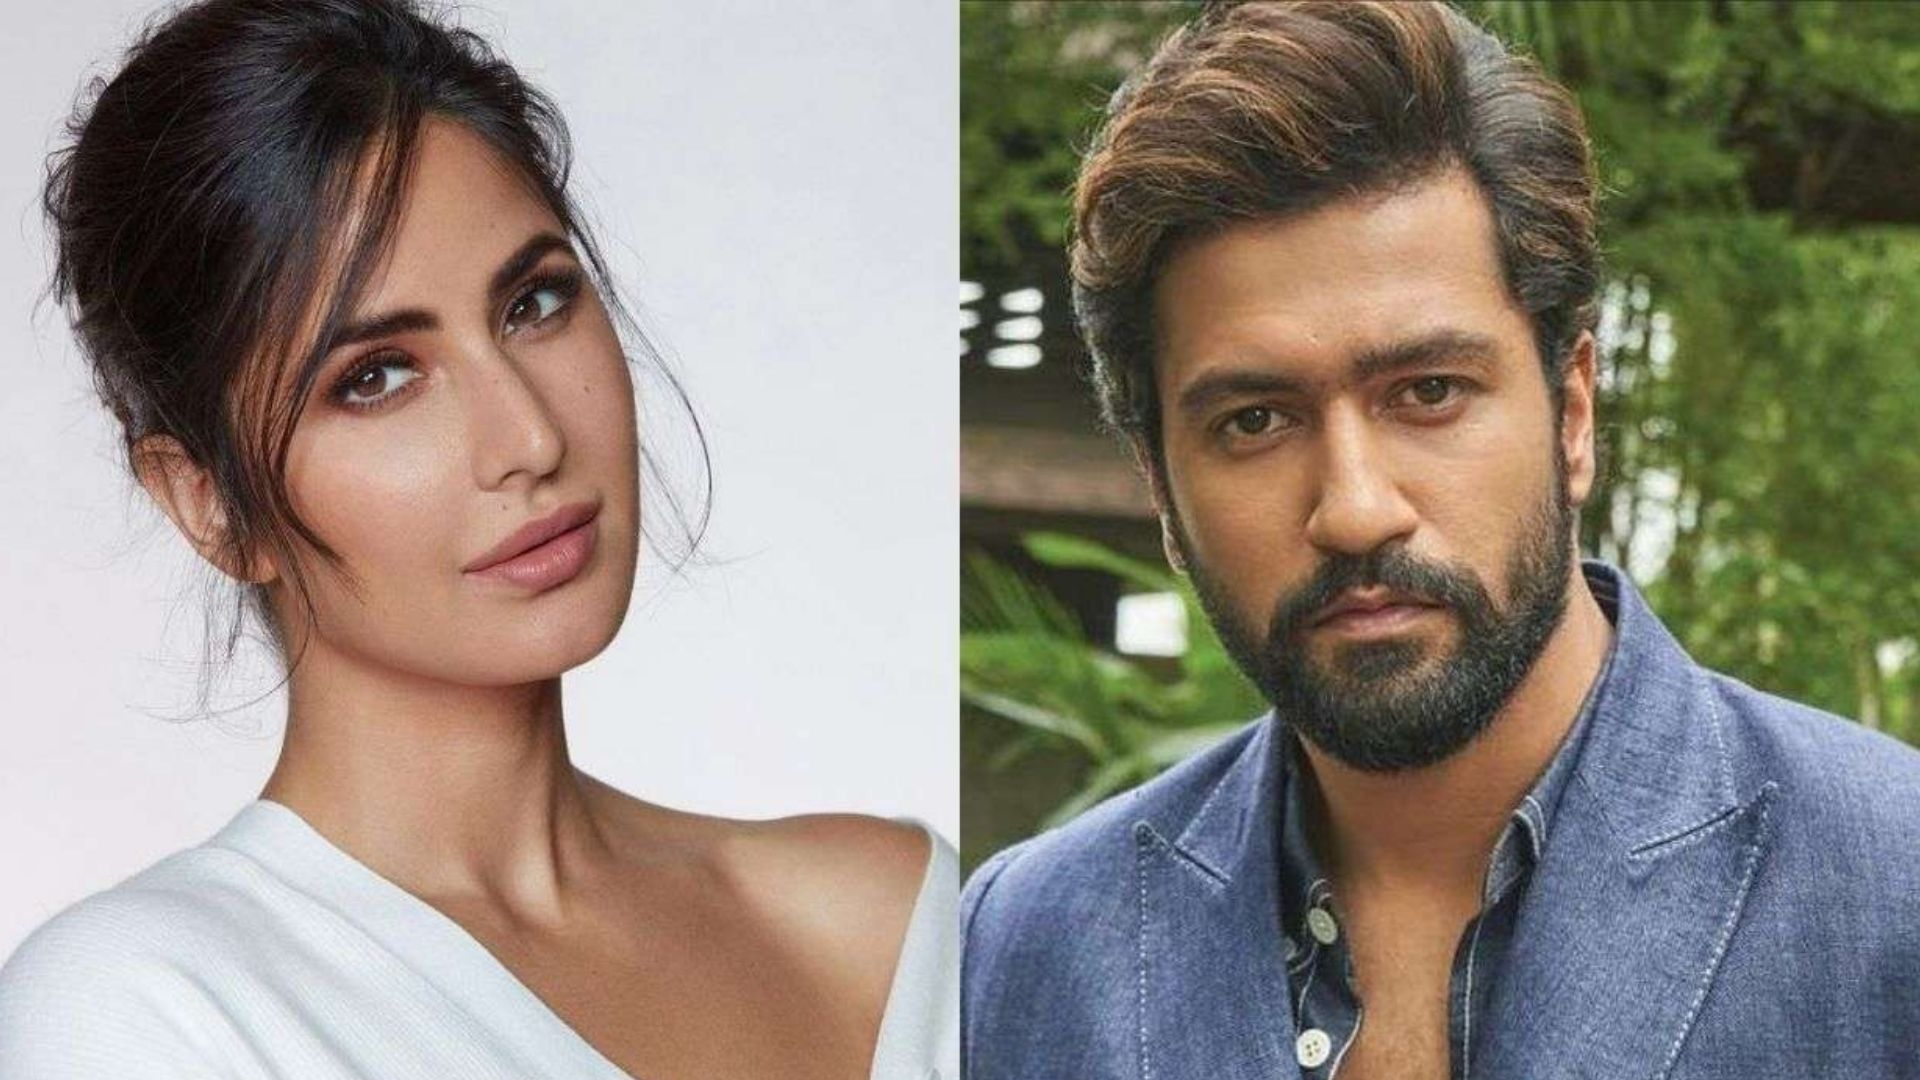 Times When Bollywood's Rumoured Couple Vicky Kaushal And Katrina Kaif's Affair Made Headlines